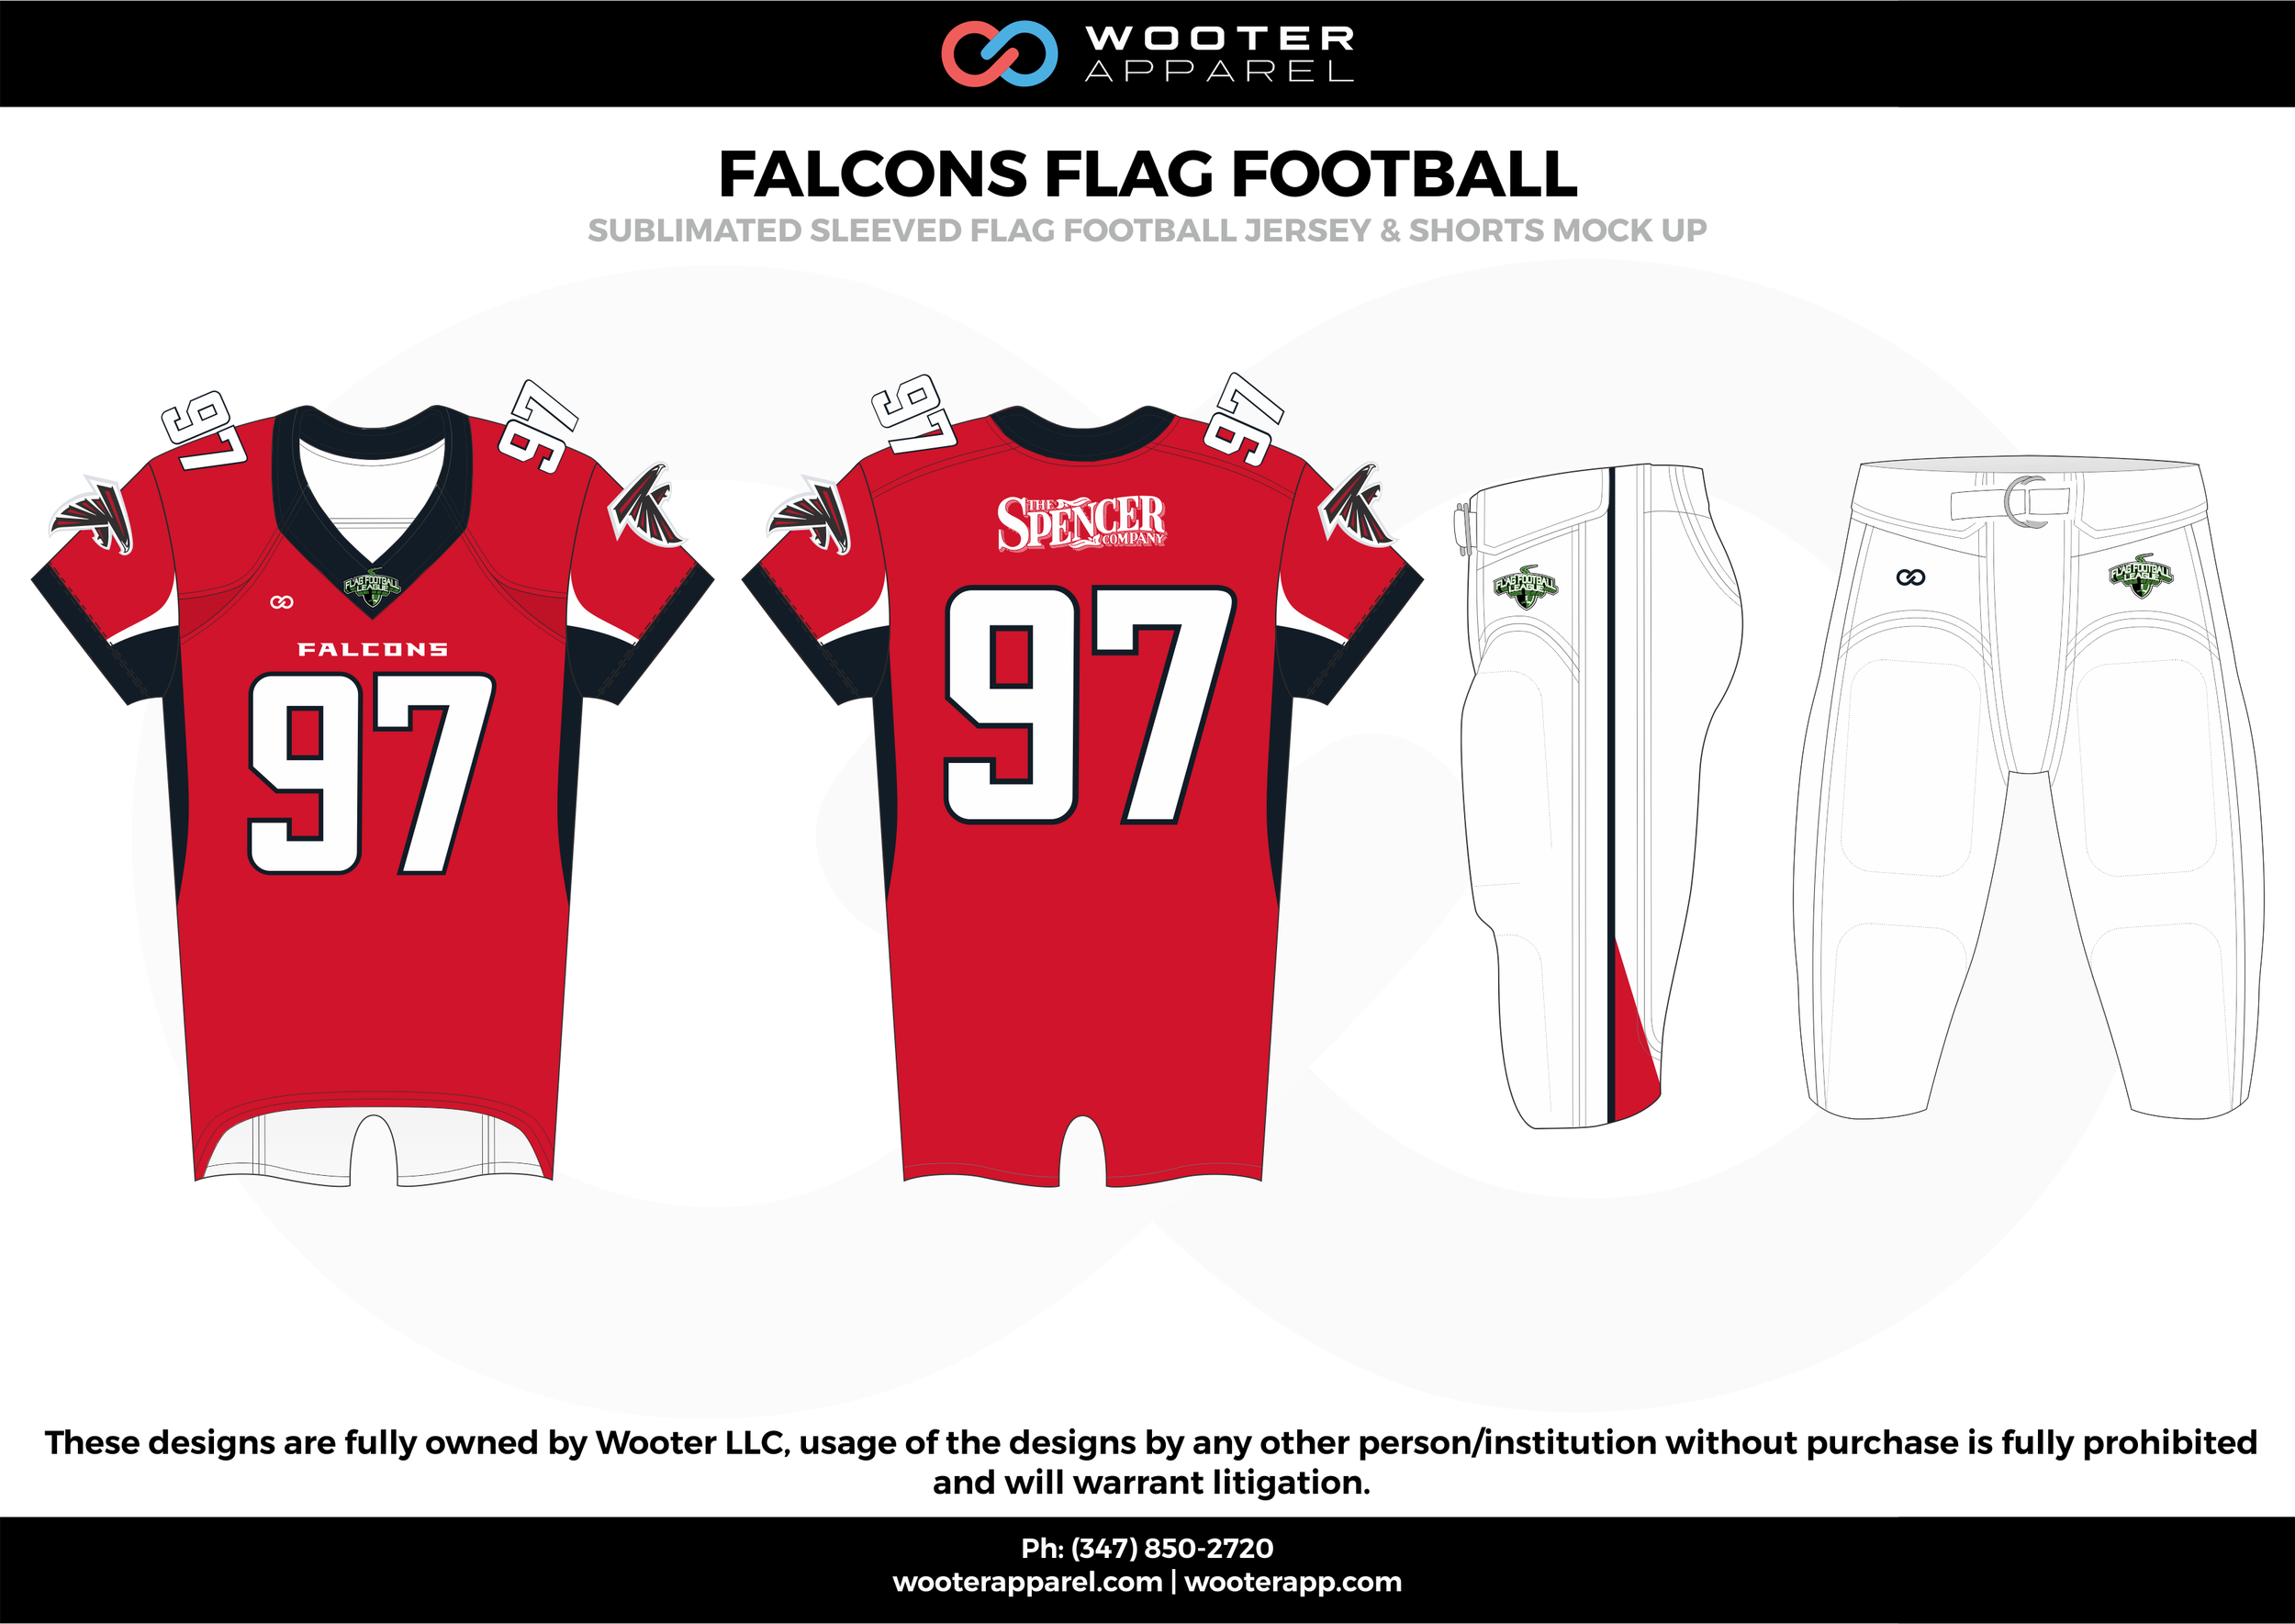 FALCONS FLAG FOOTBALL red black white flag football uniforms jerseys pants